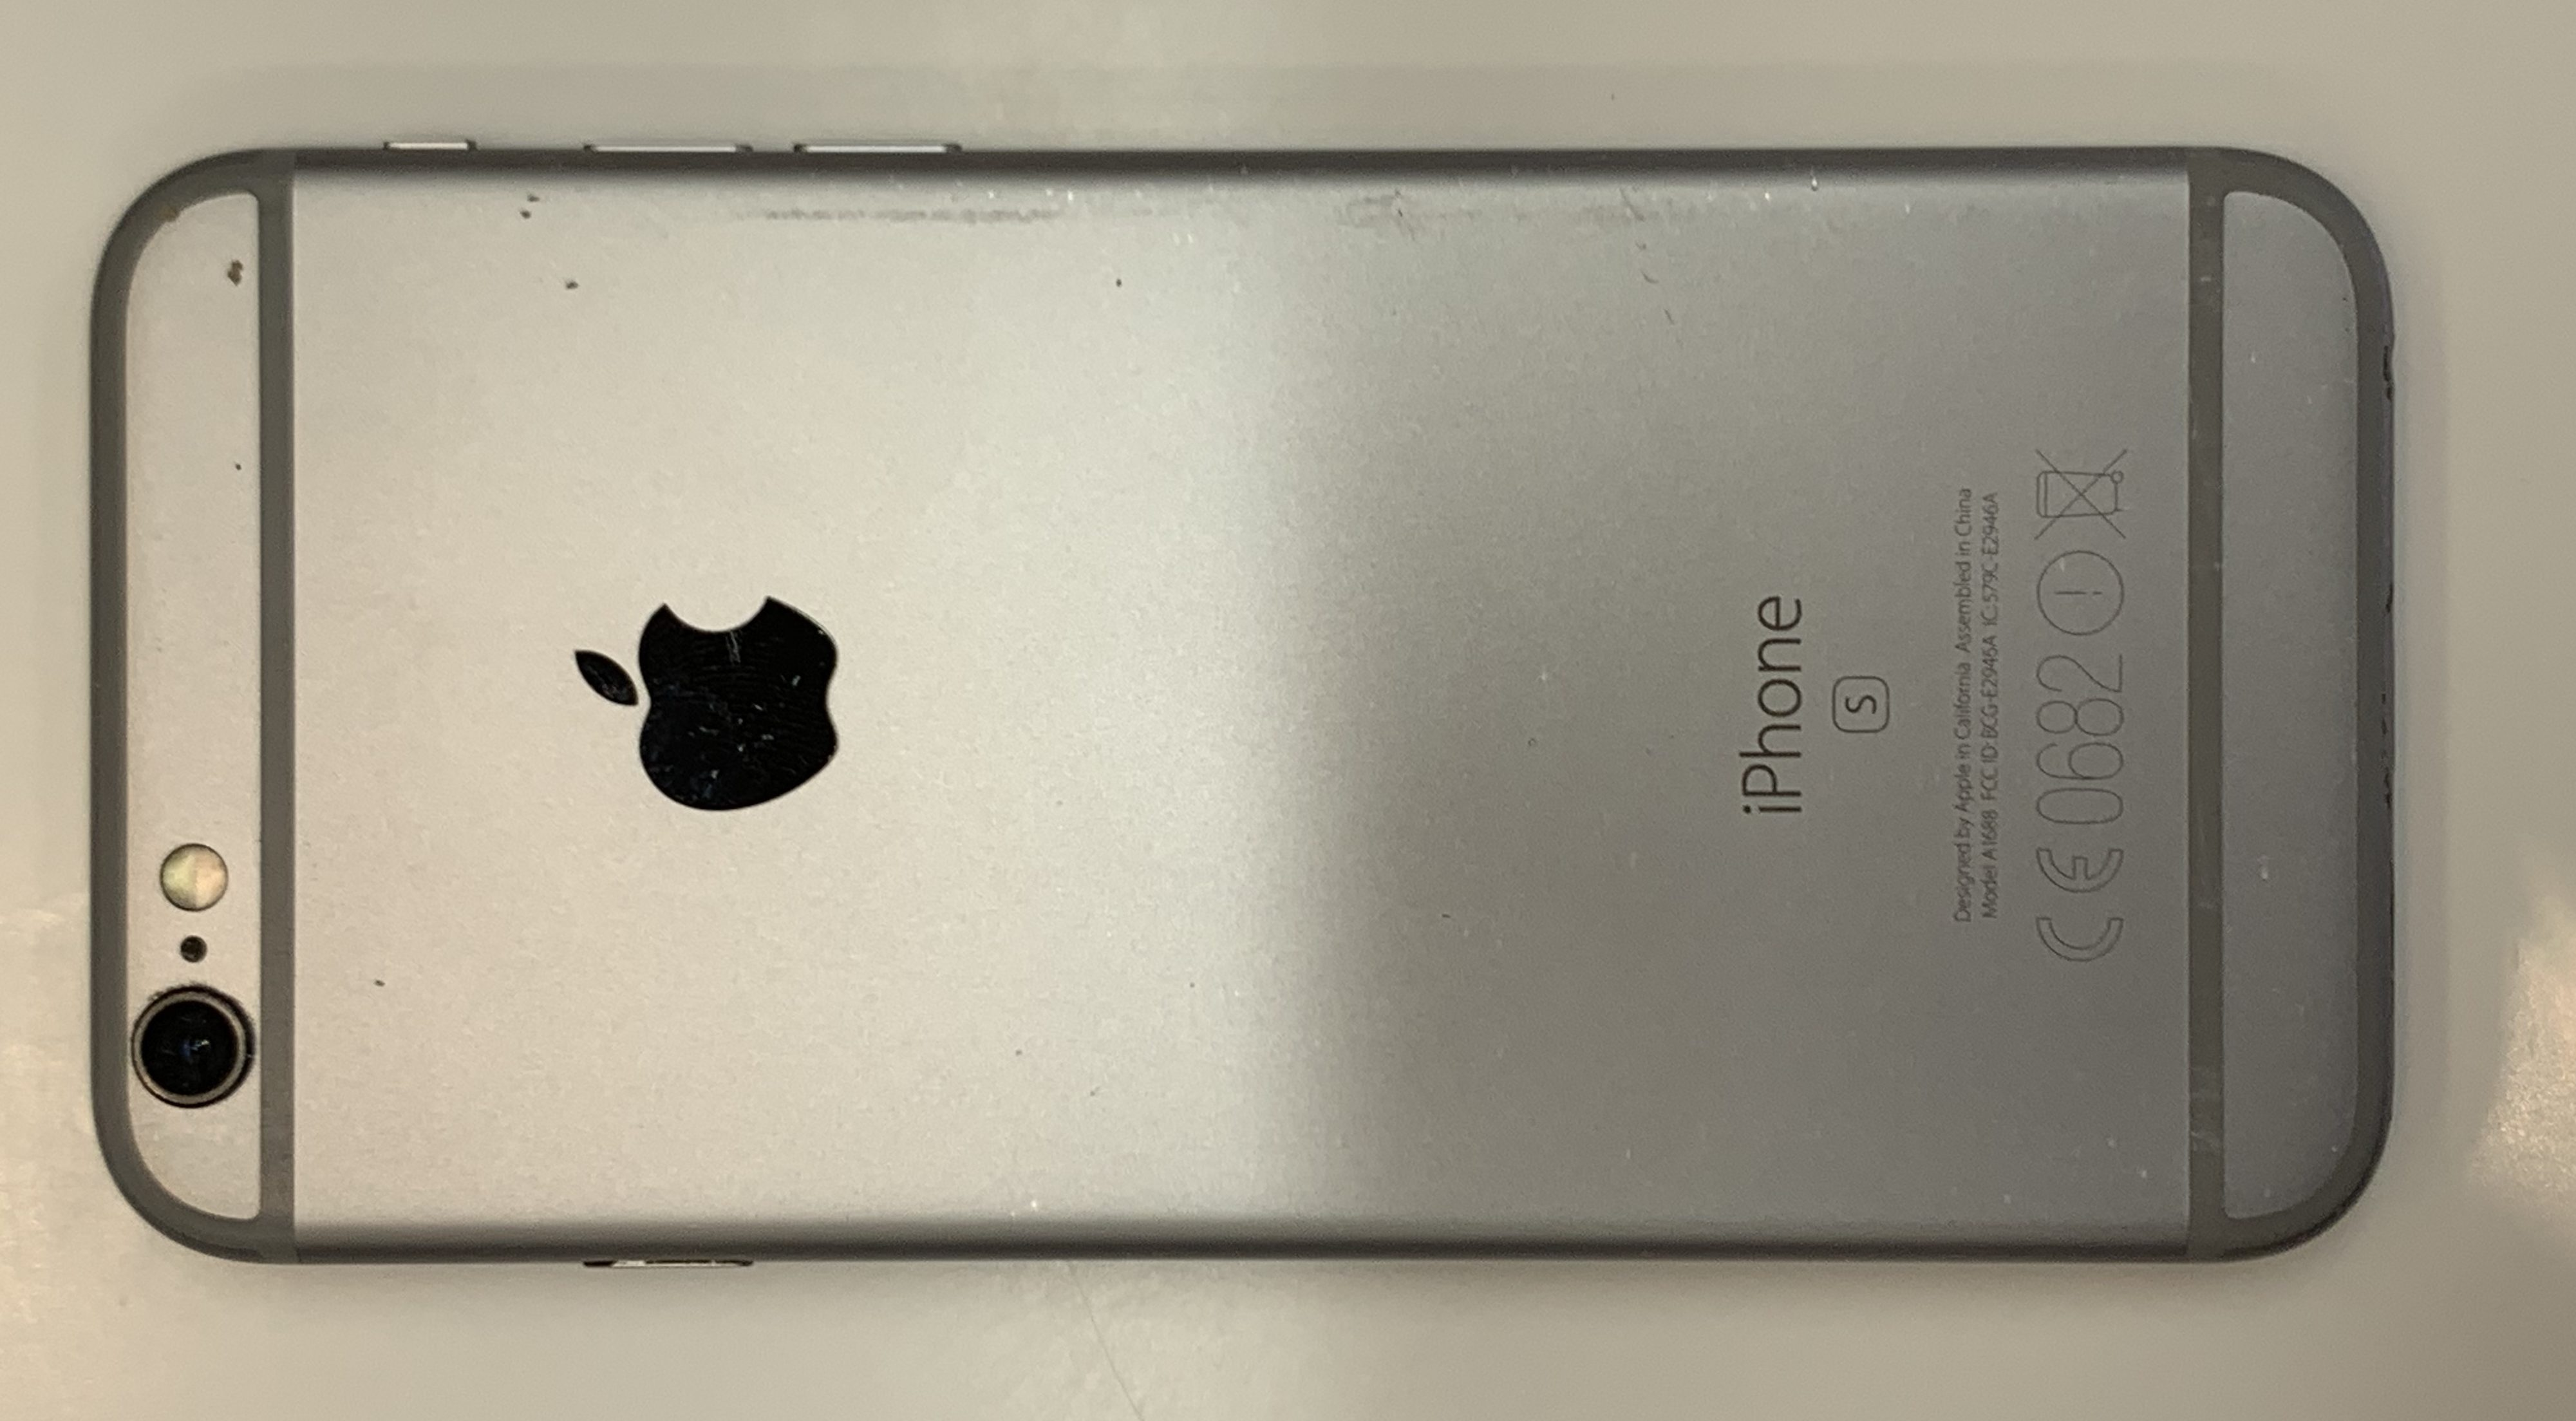 iPhone 6S 16GB, 16 GB, Space Gray, obraz 1